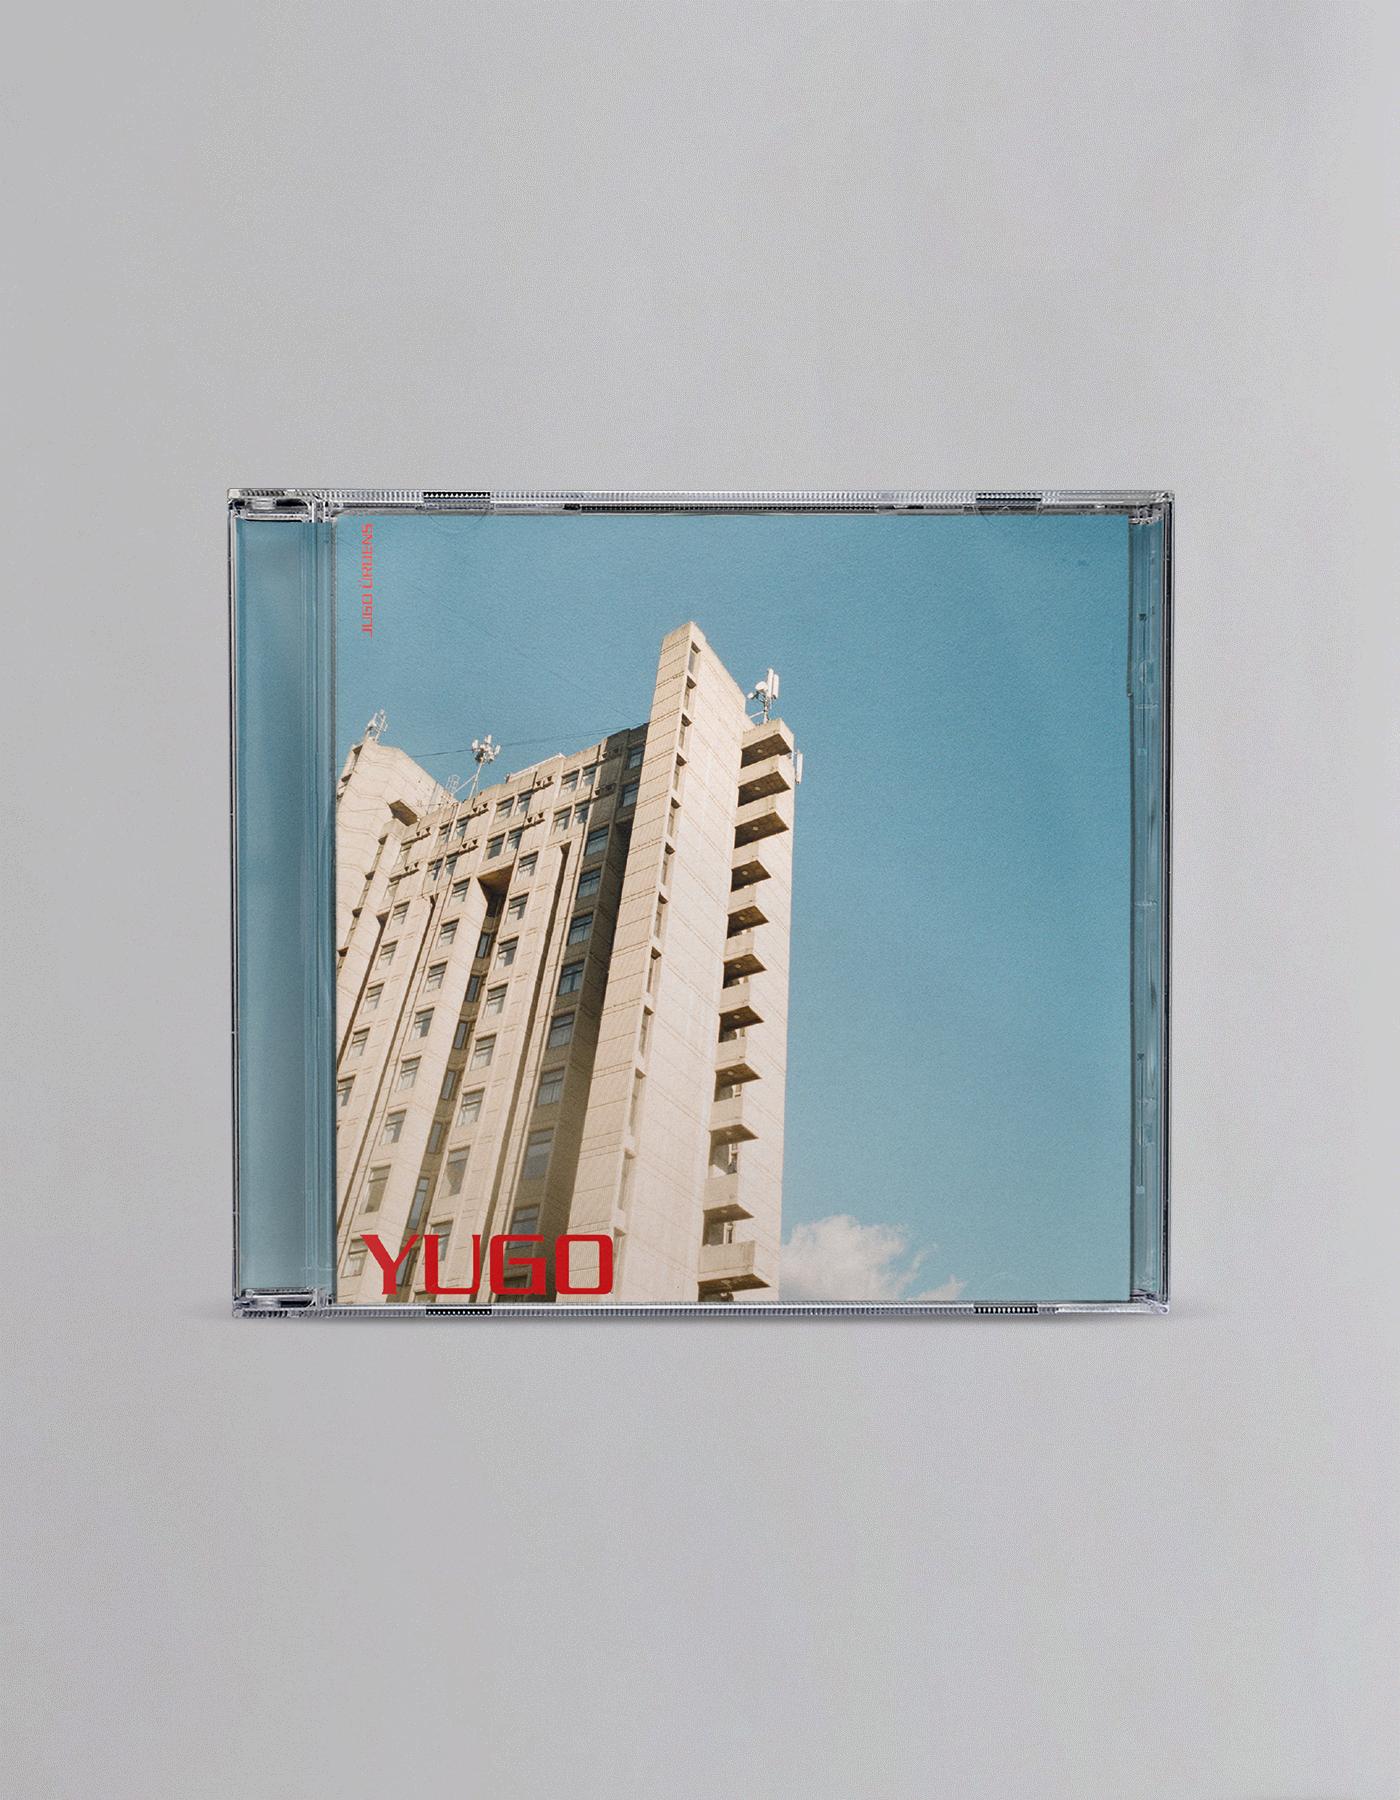 YUGO Merch - Yugo CD Bild